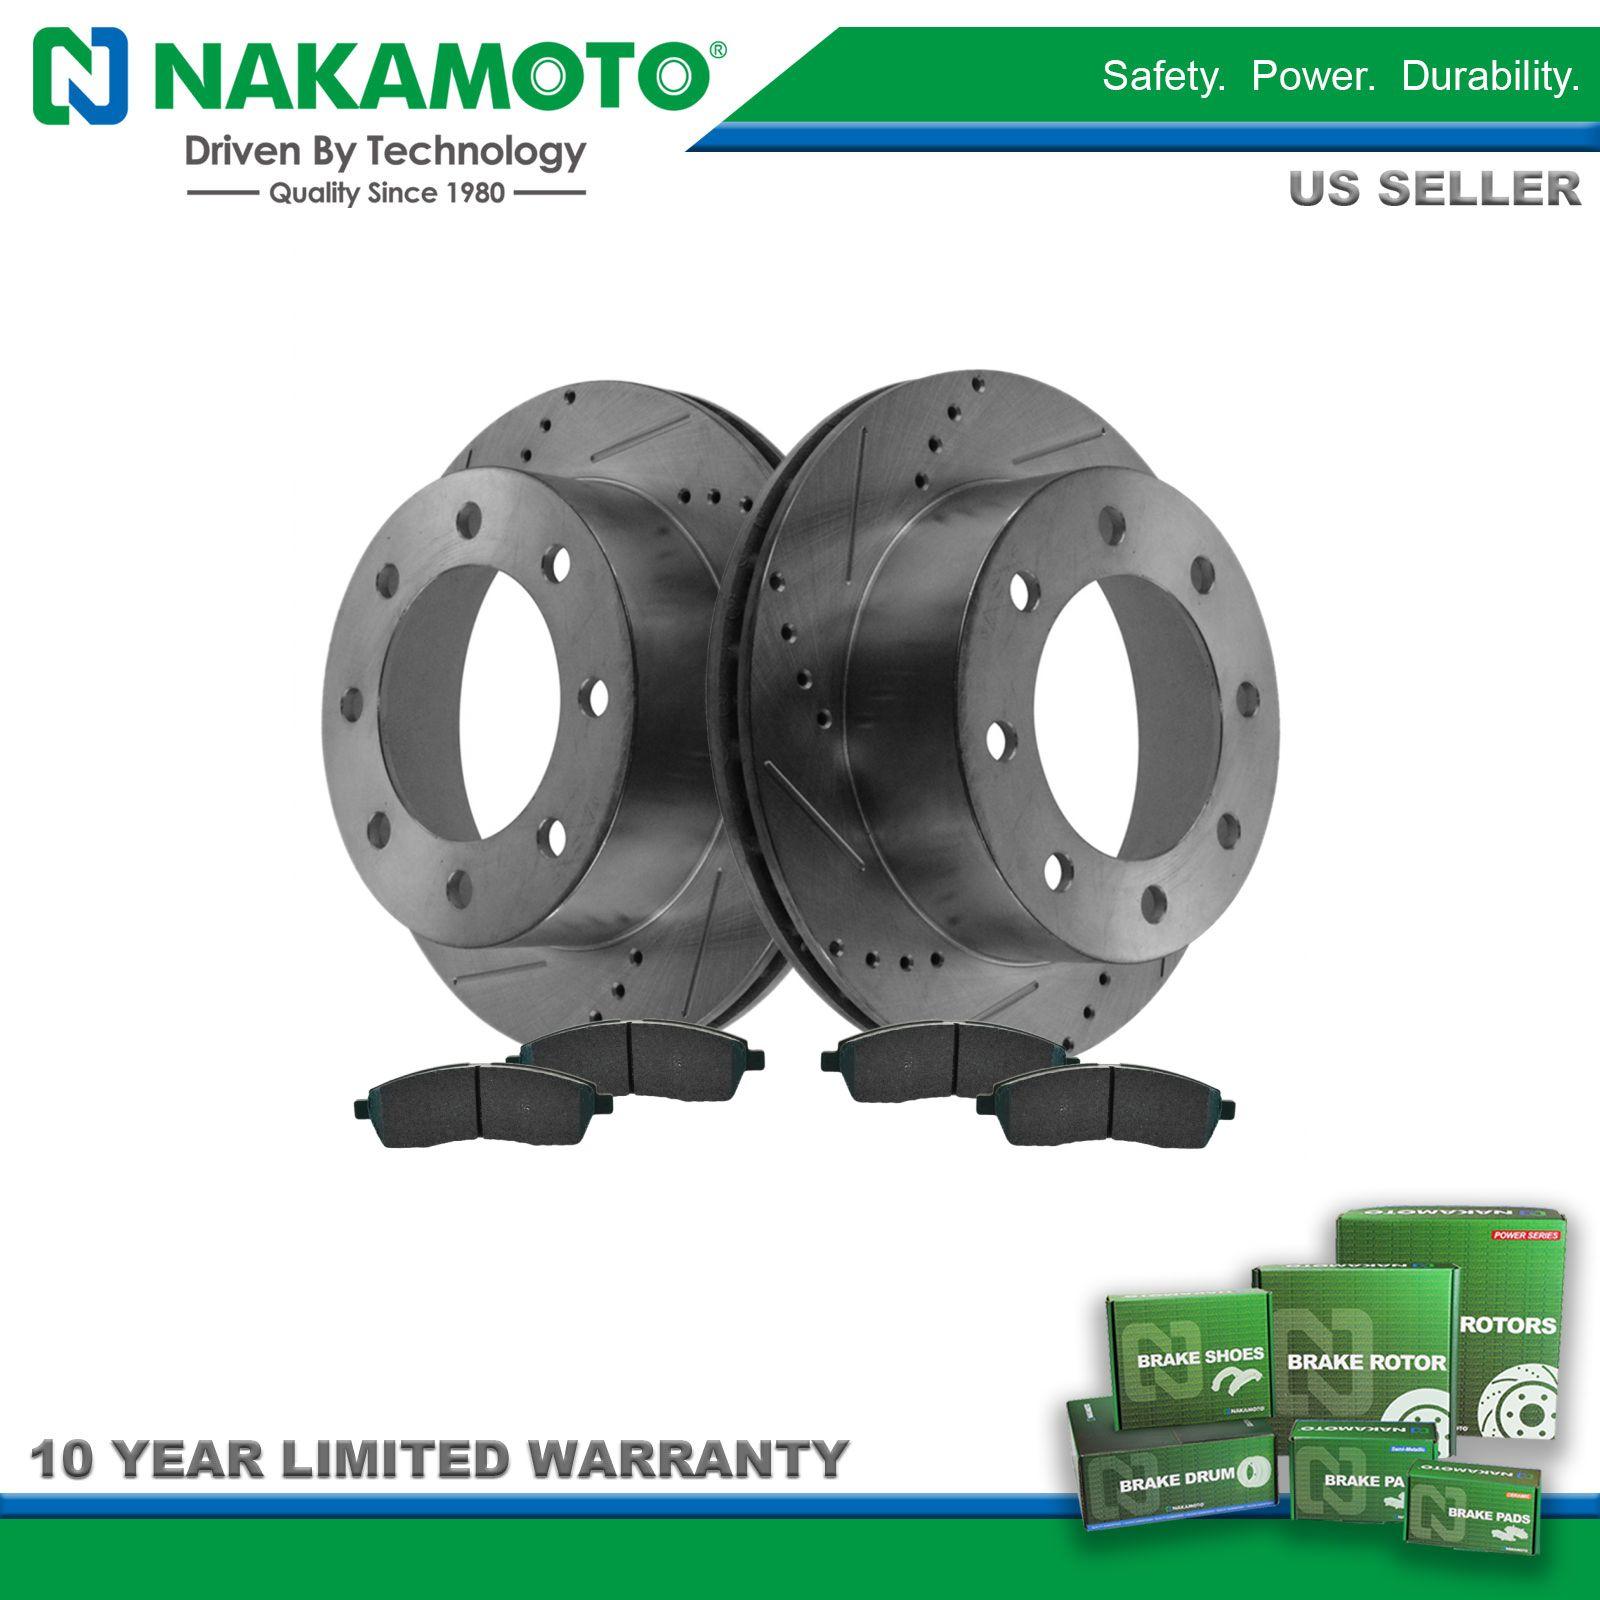 Nakamoto Ceramic Brake Pad /& Performance Drilled Slotted Rotor Rear Kit